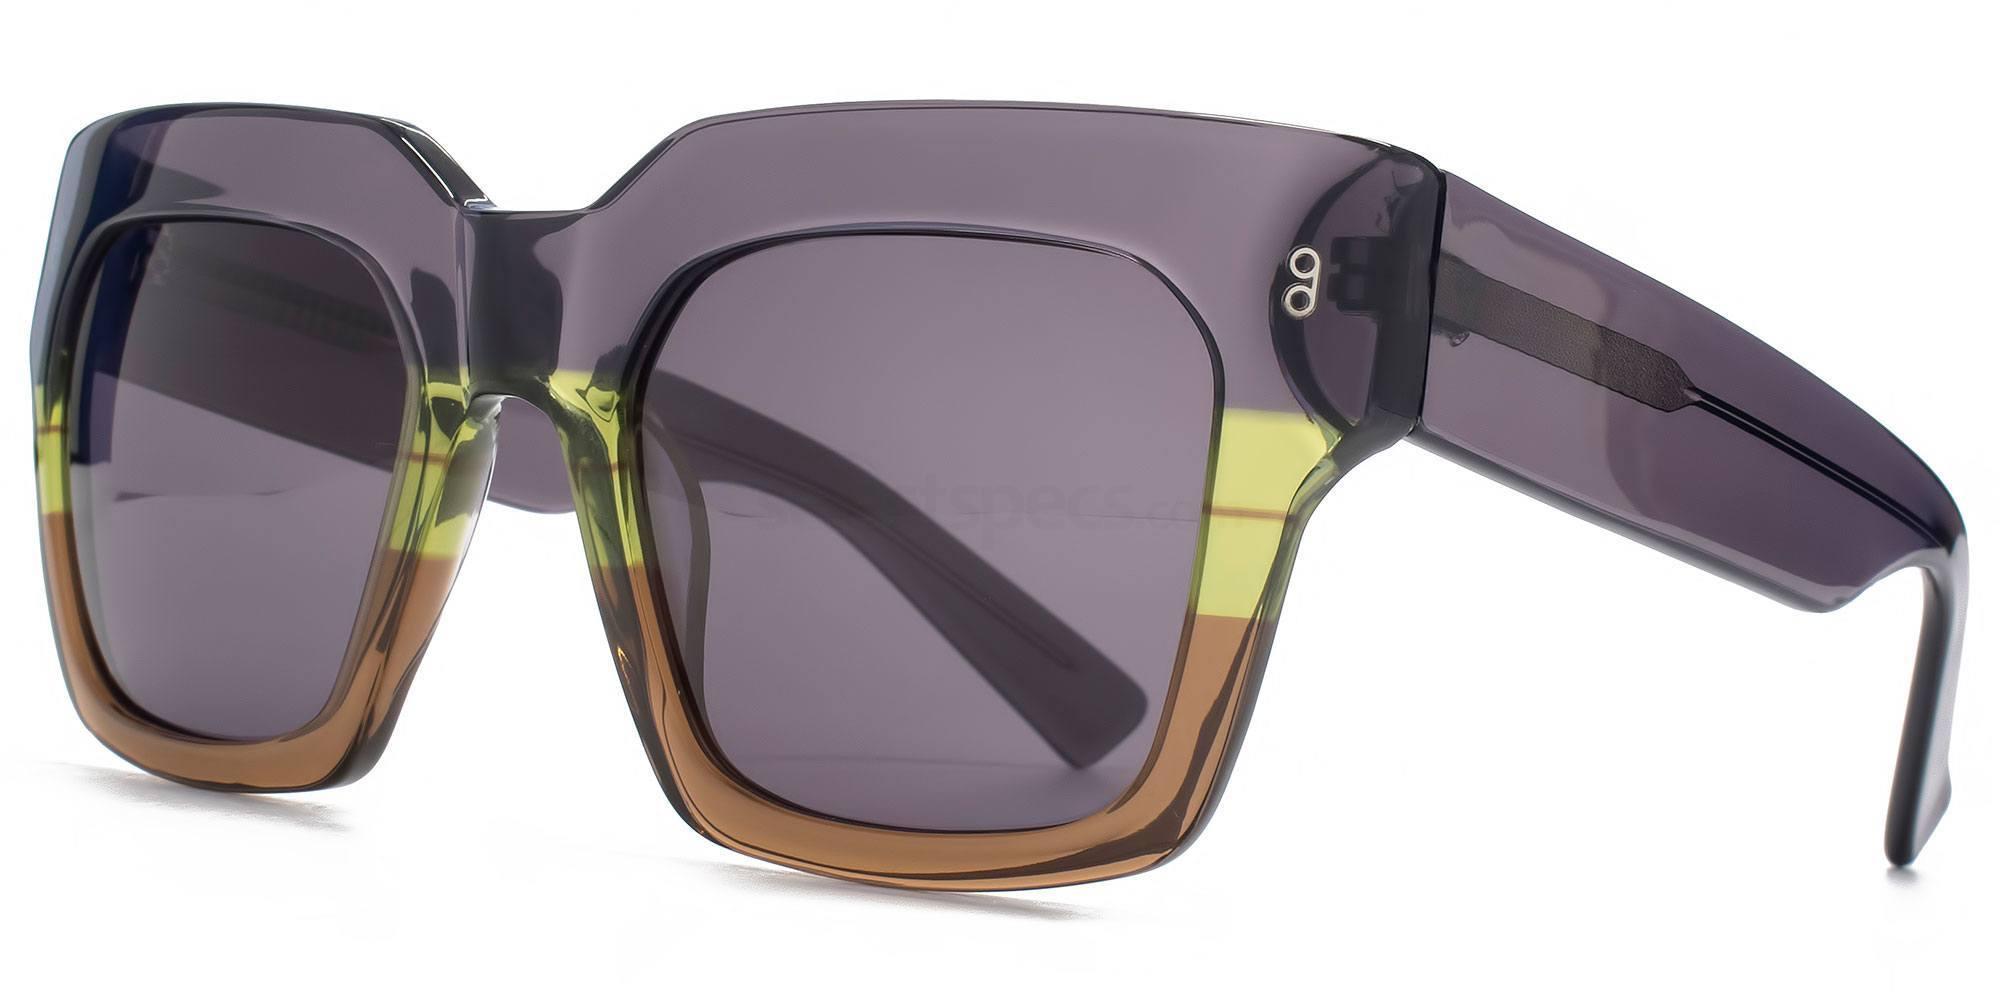 DGRY HK009 - GENESIS Sunglasses, Hook LDN